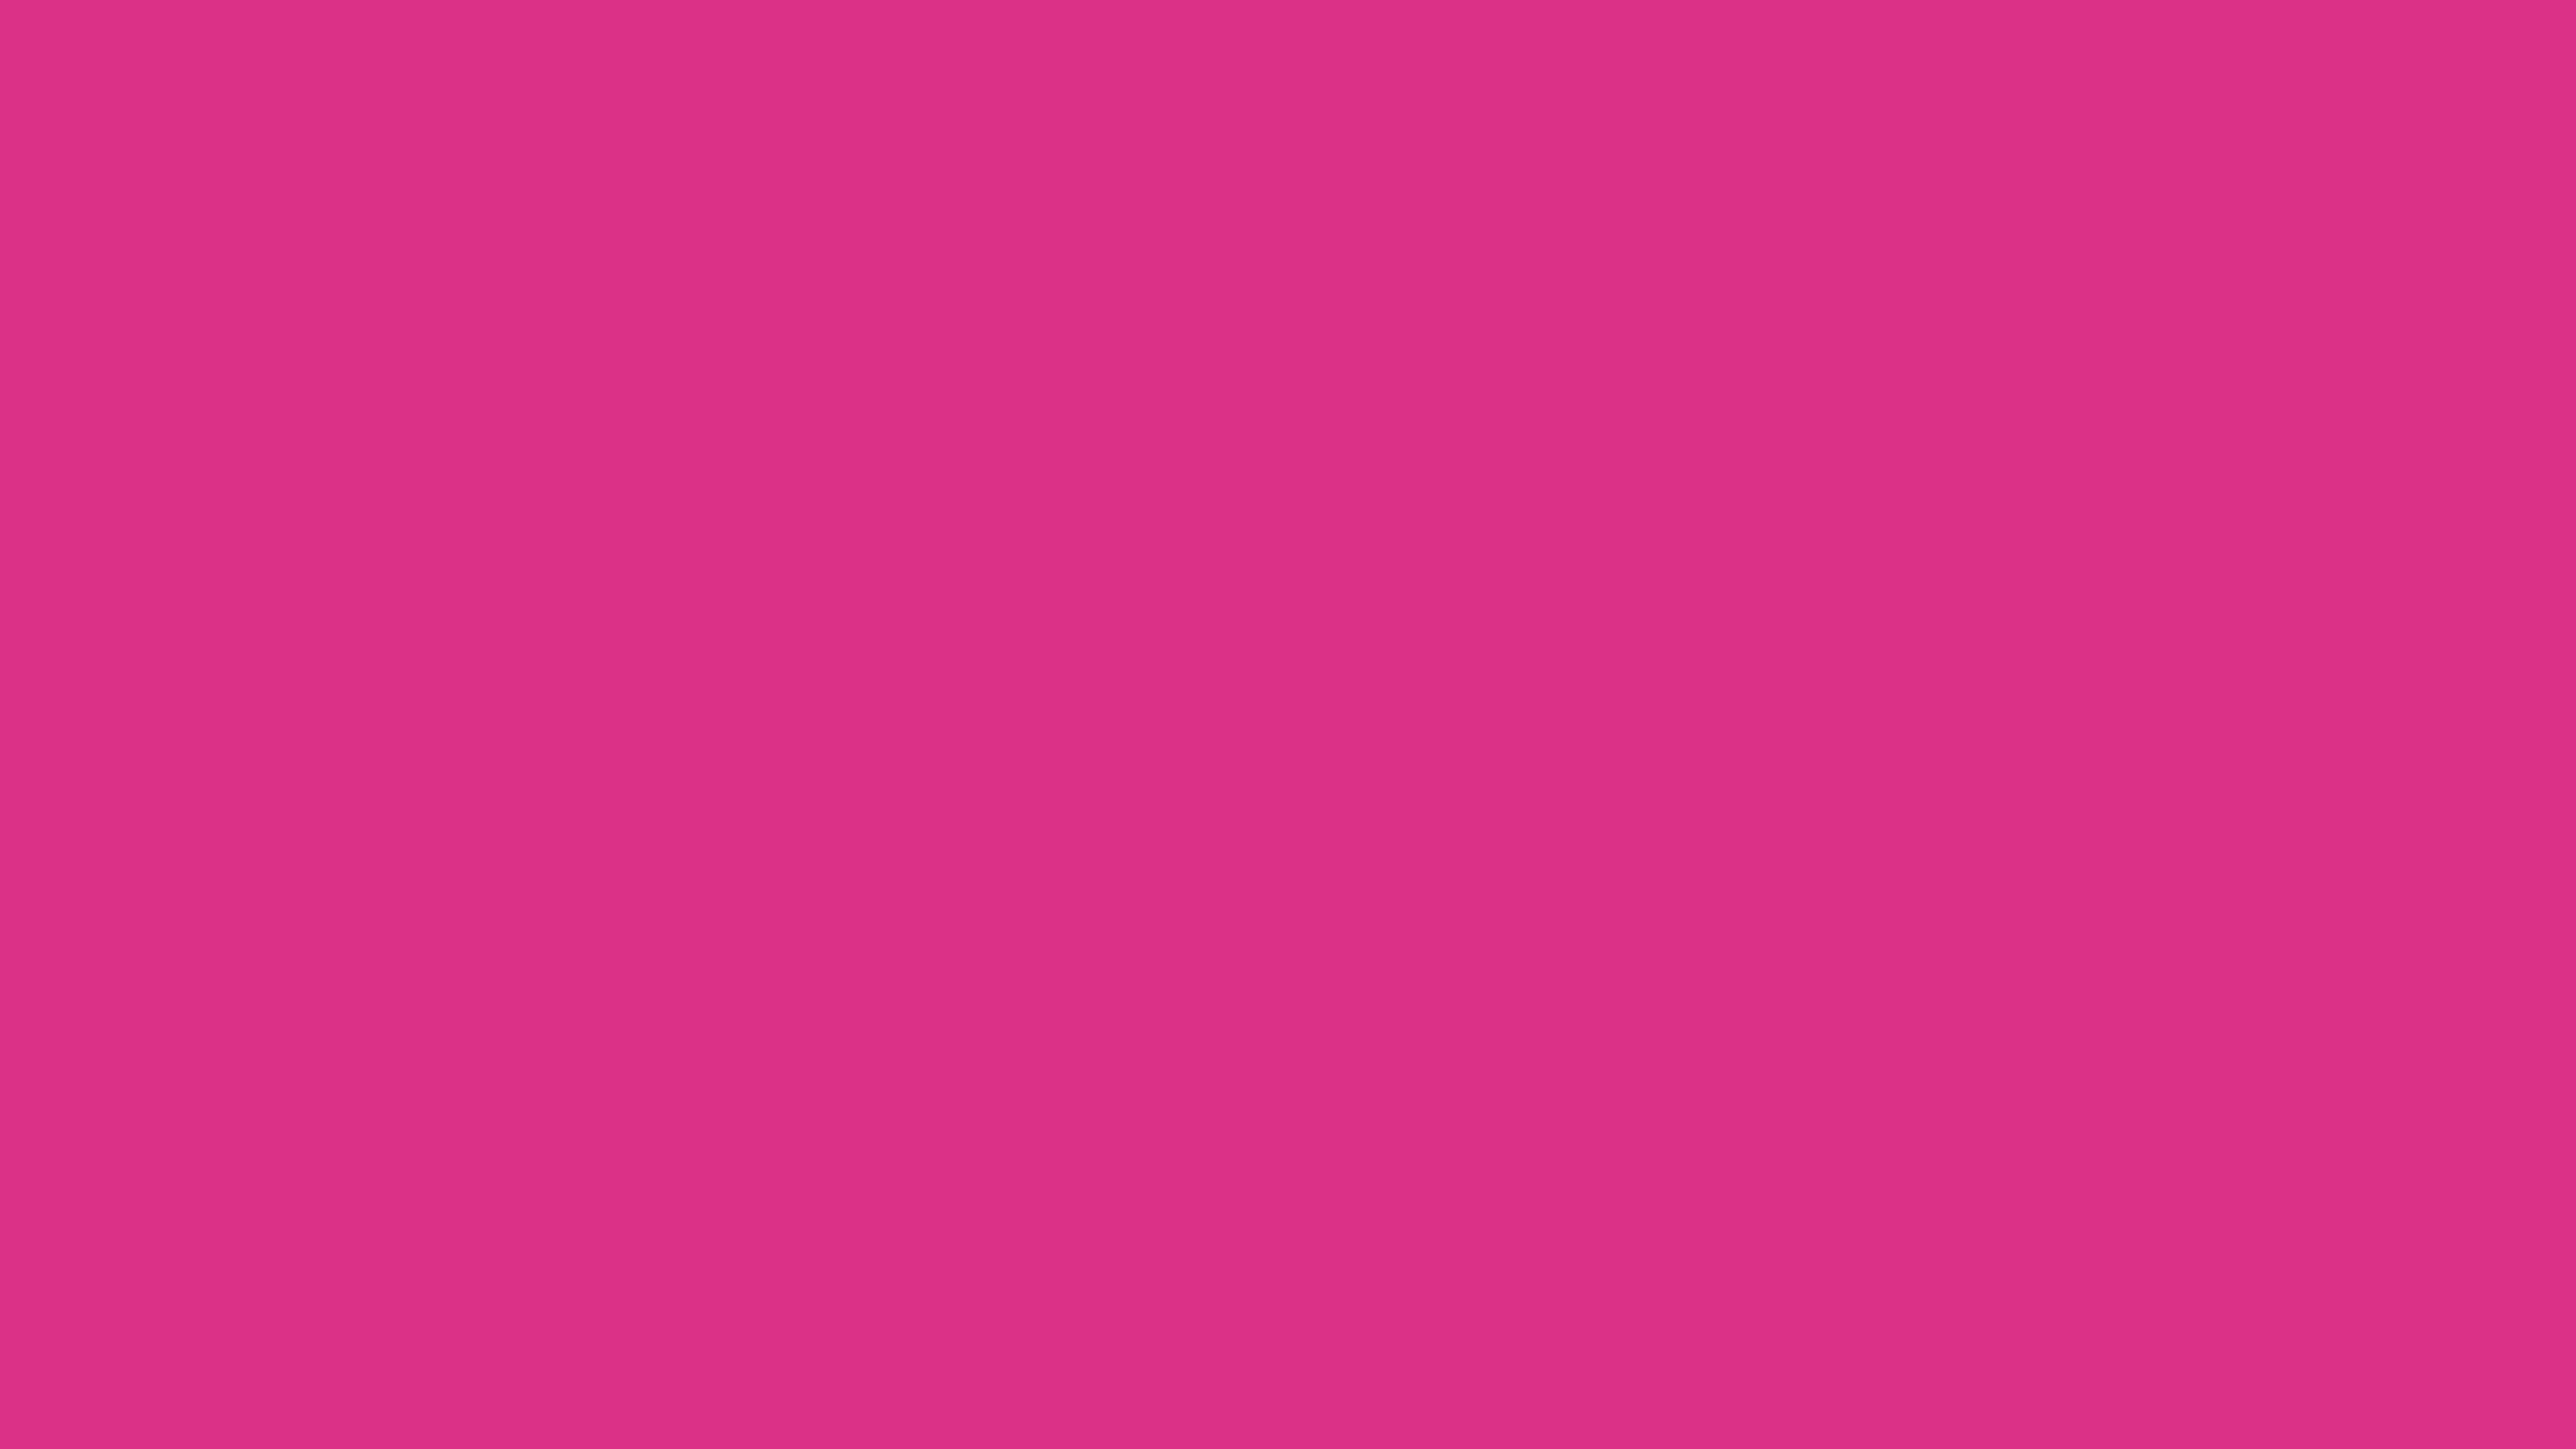 5120x2880 Deep Cerise Solid Color Background